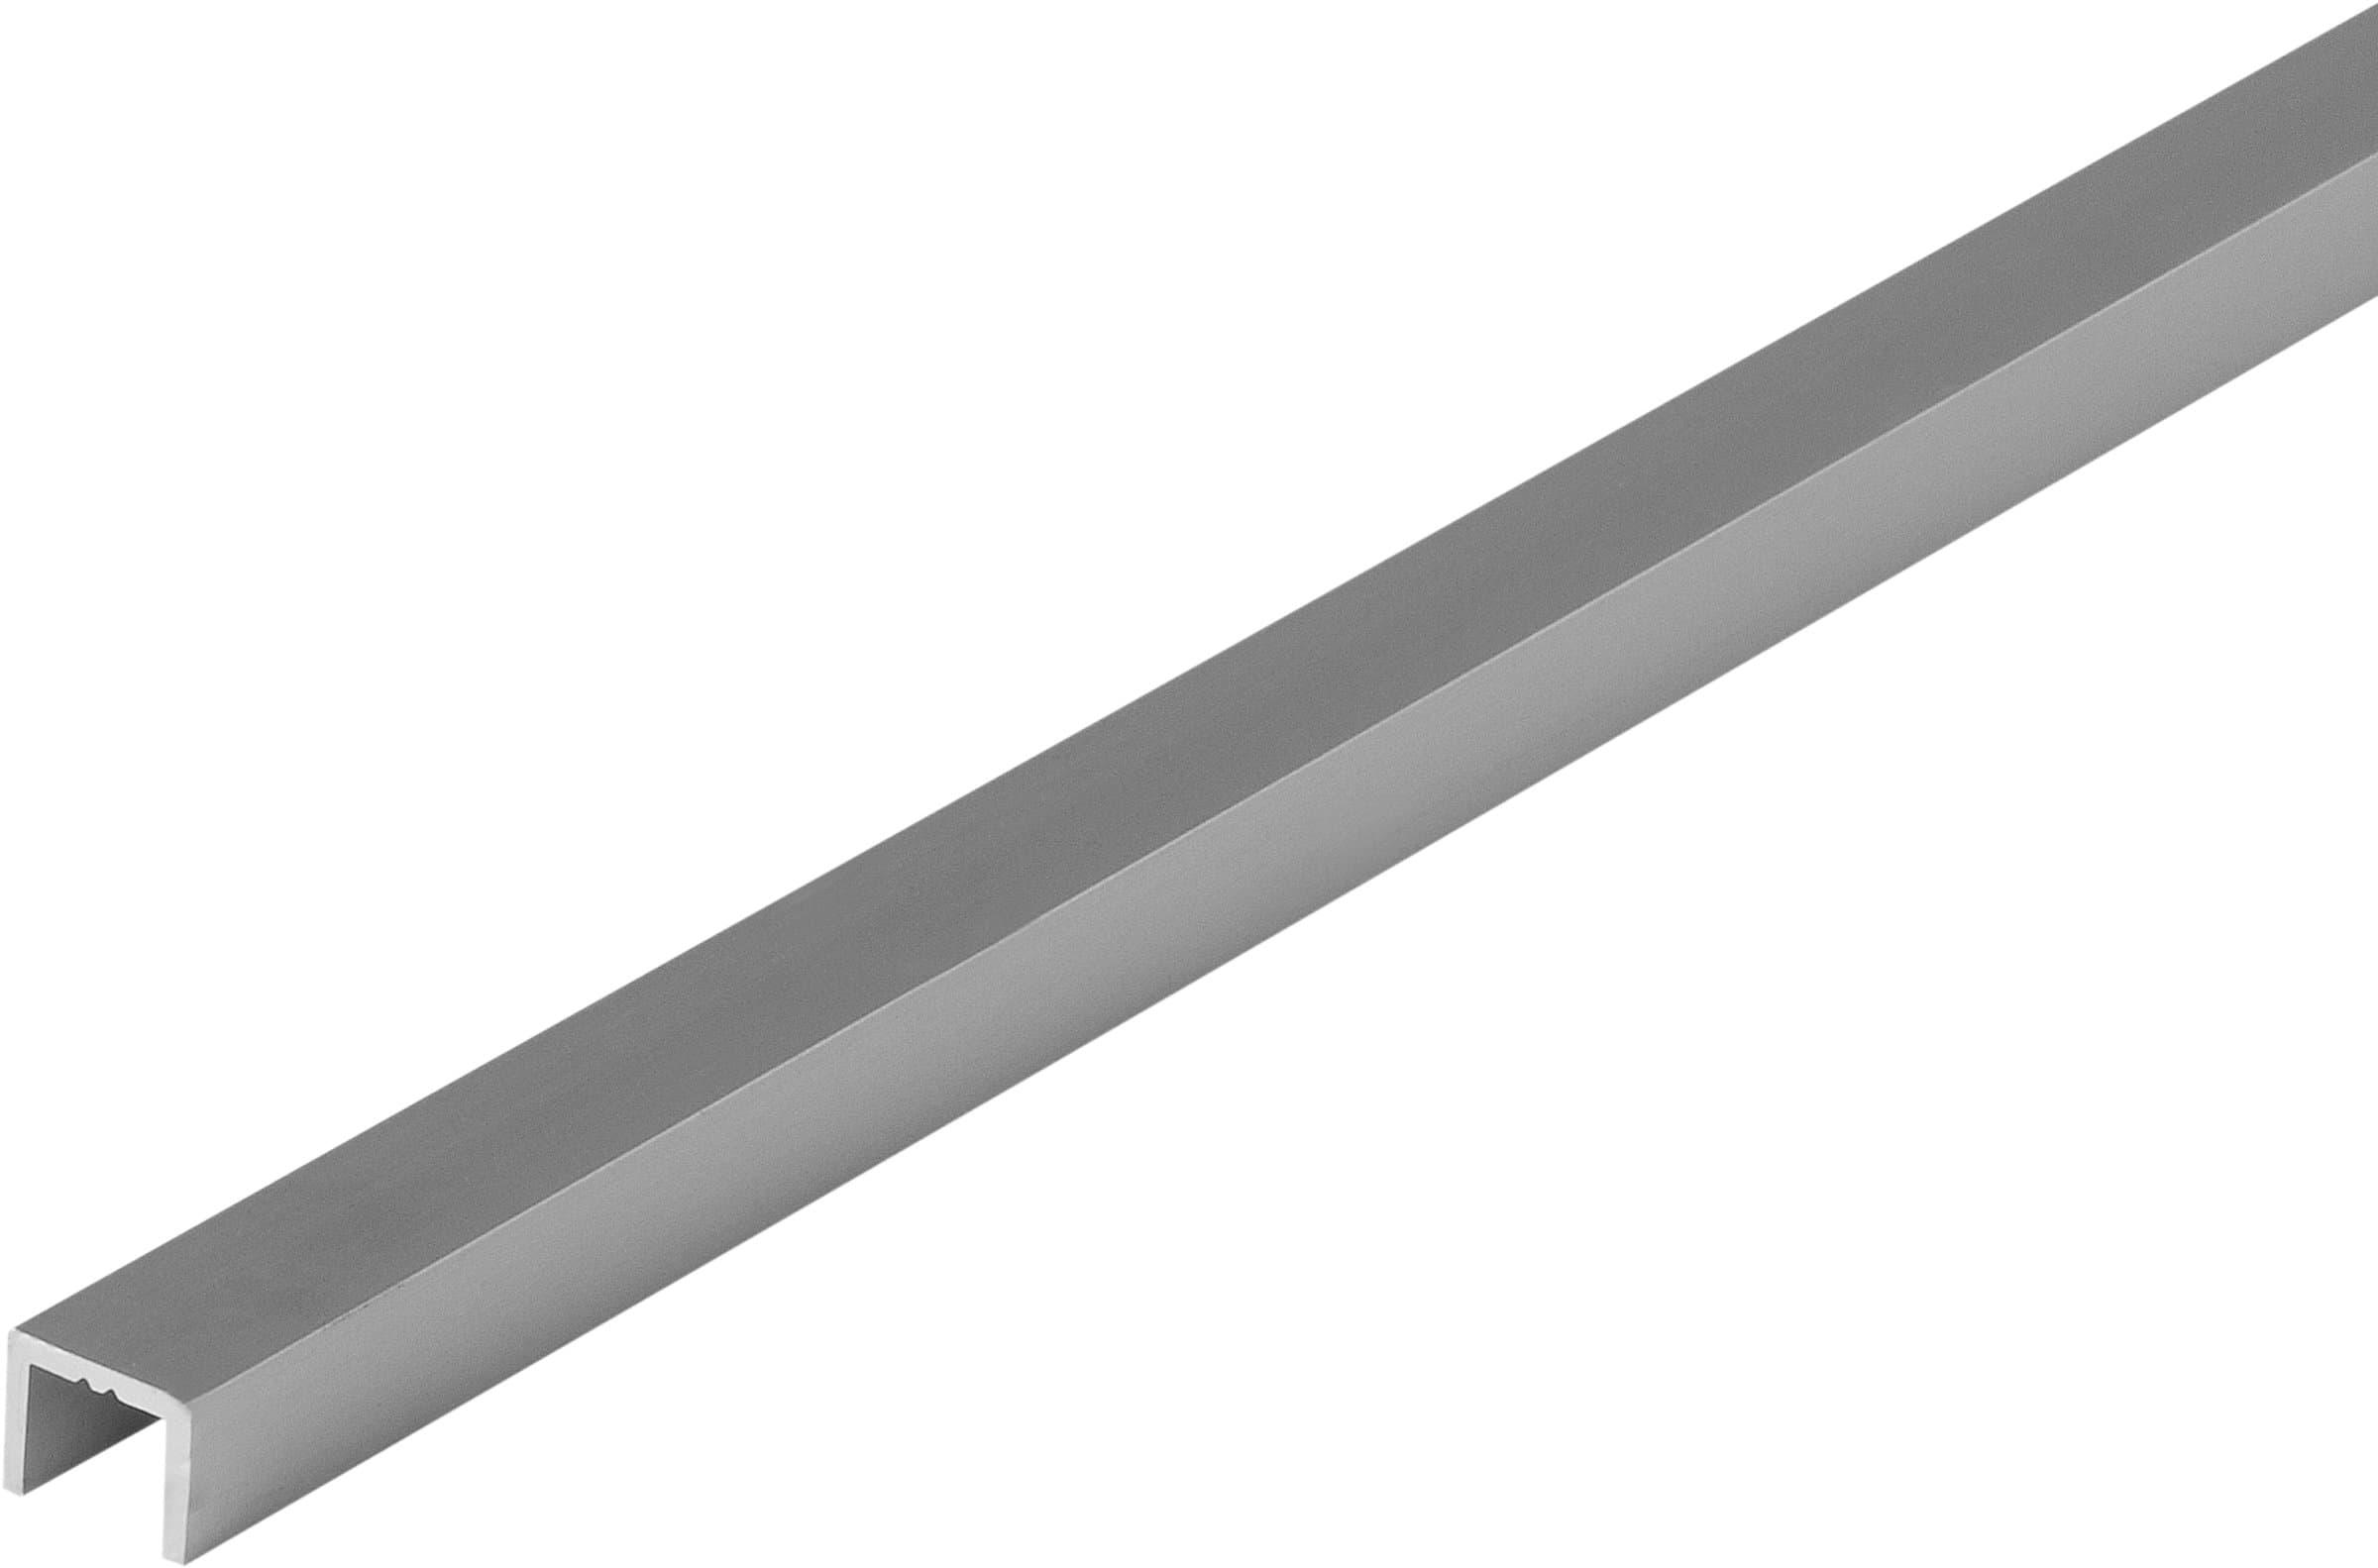 alfer U-Profilé 1.3 x 8 x 10,1 mm argent 1 m